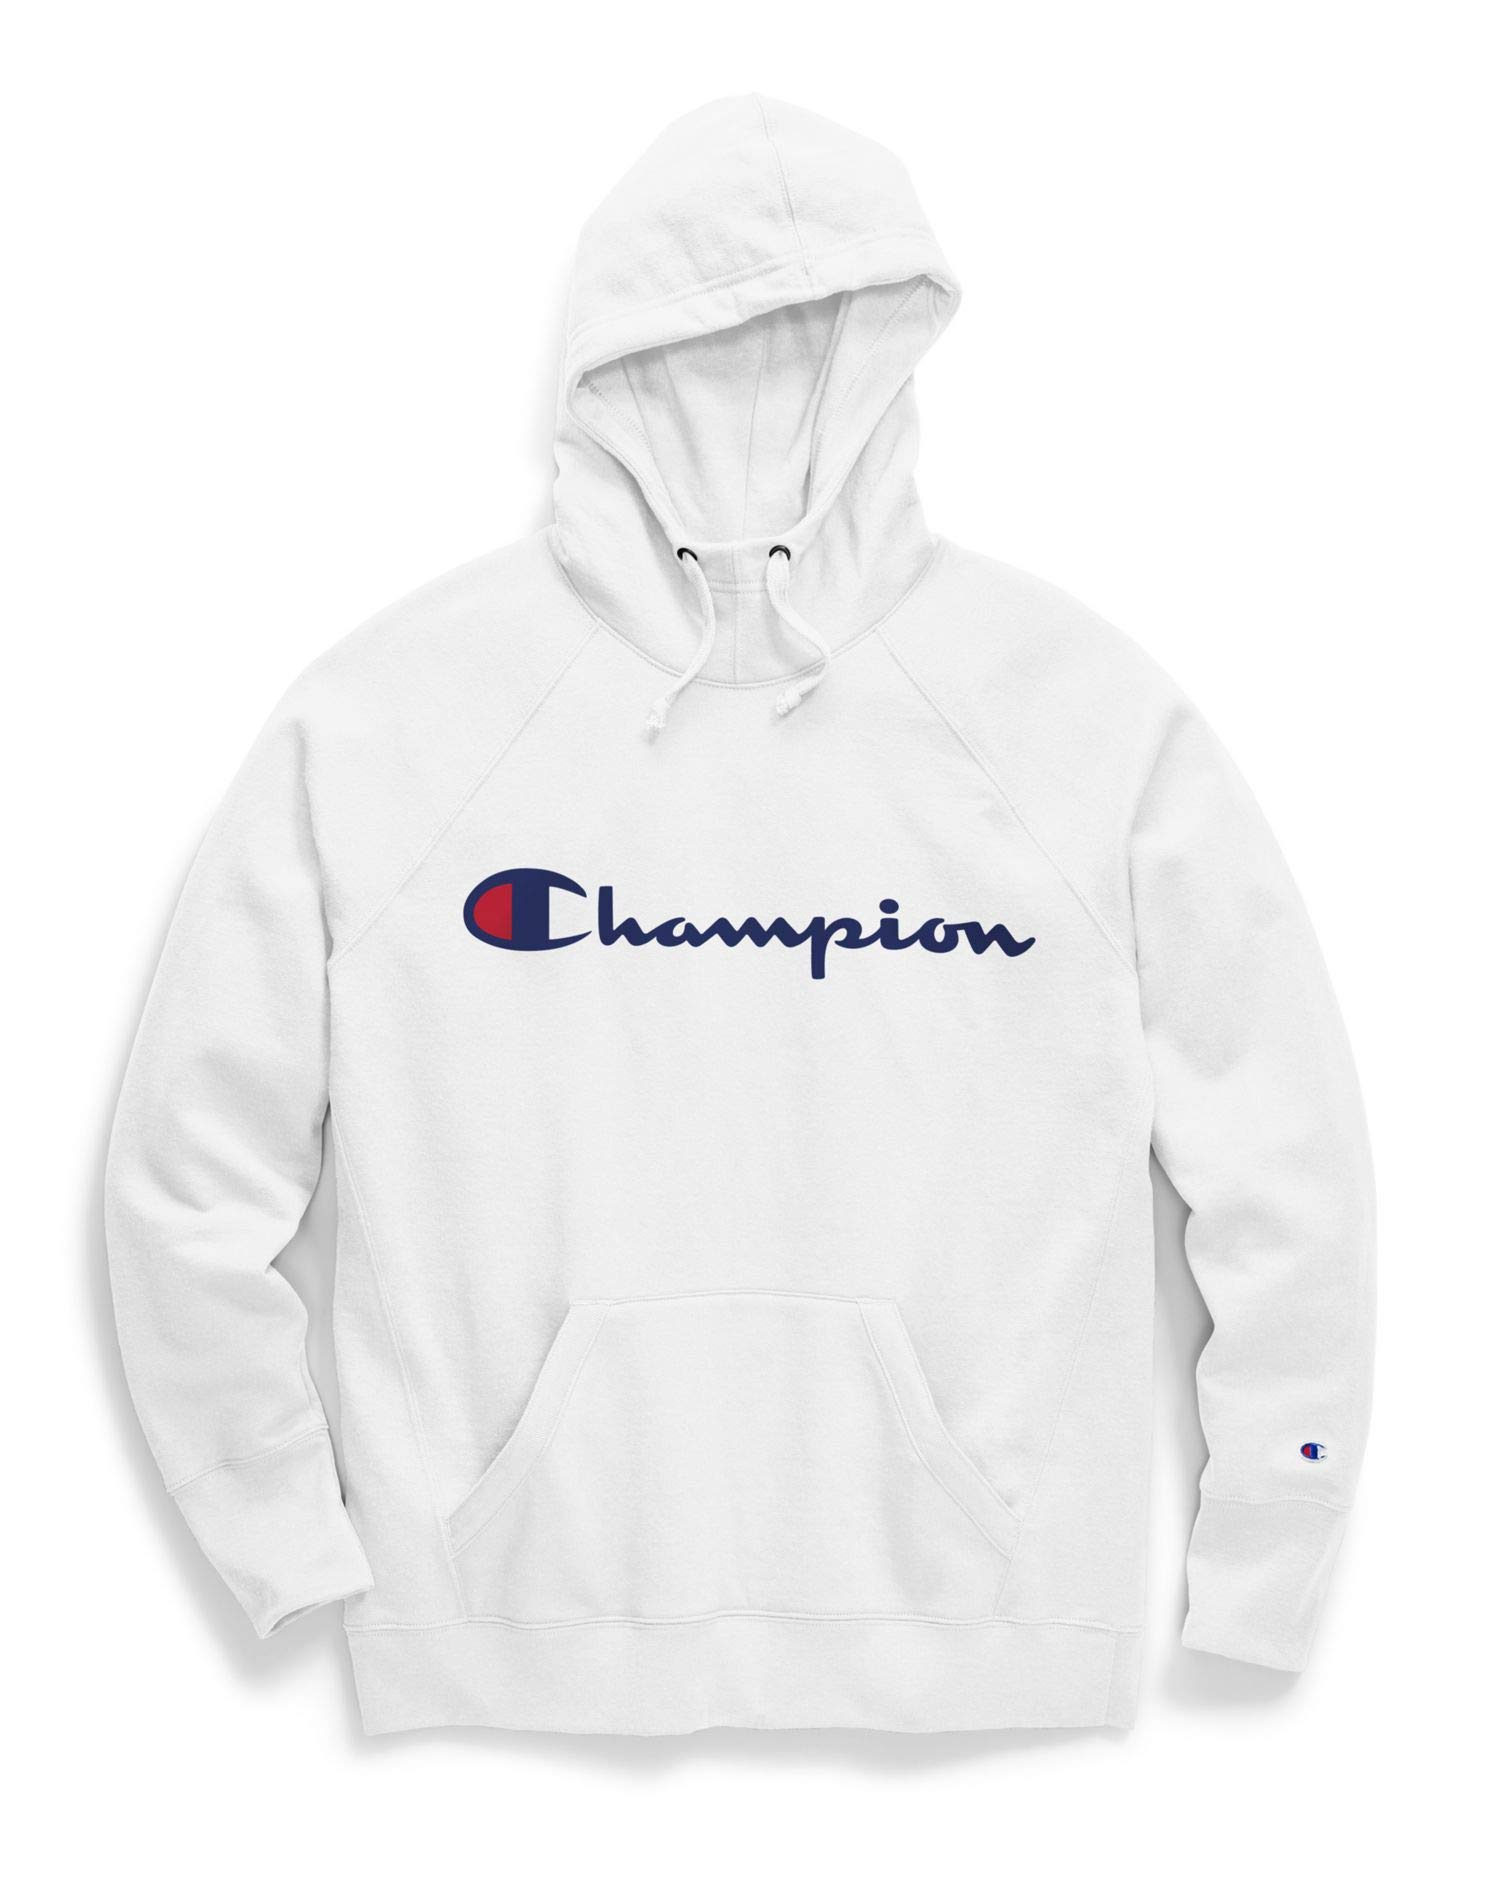 Champion Women's Powerblend Hoodie, White w/Graphic, Medium by Champion